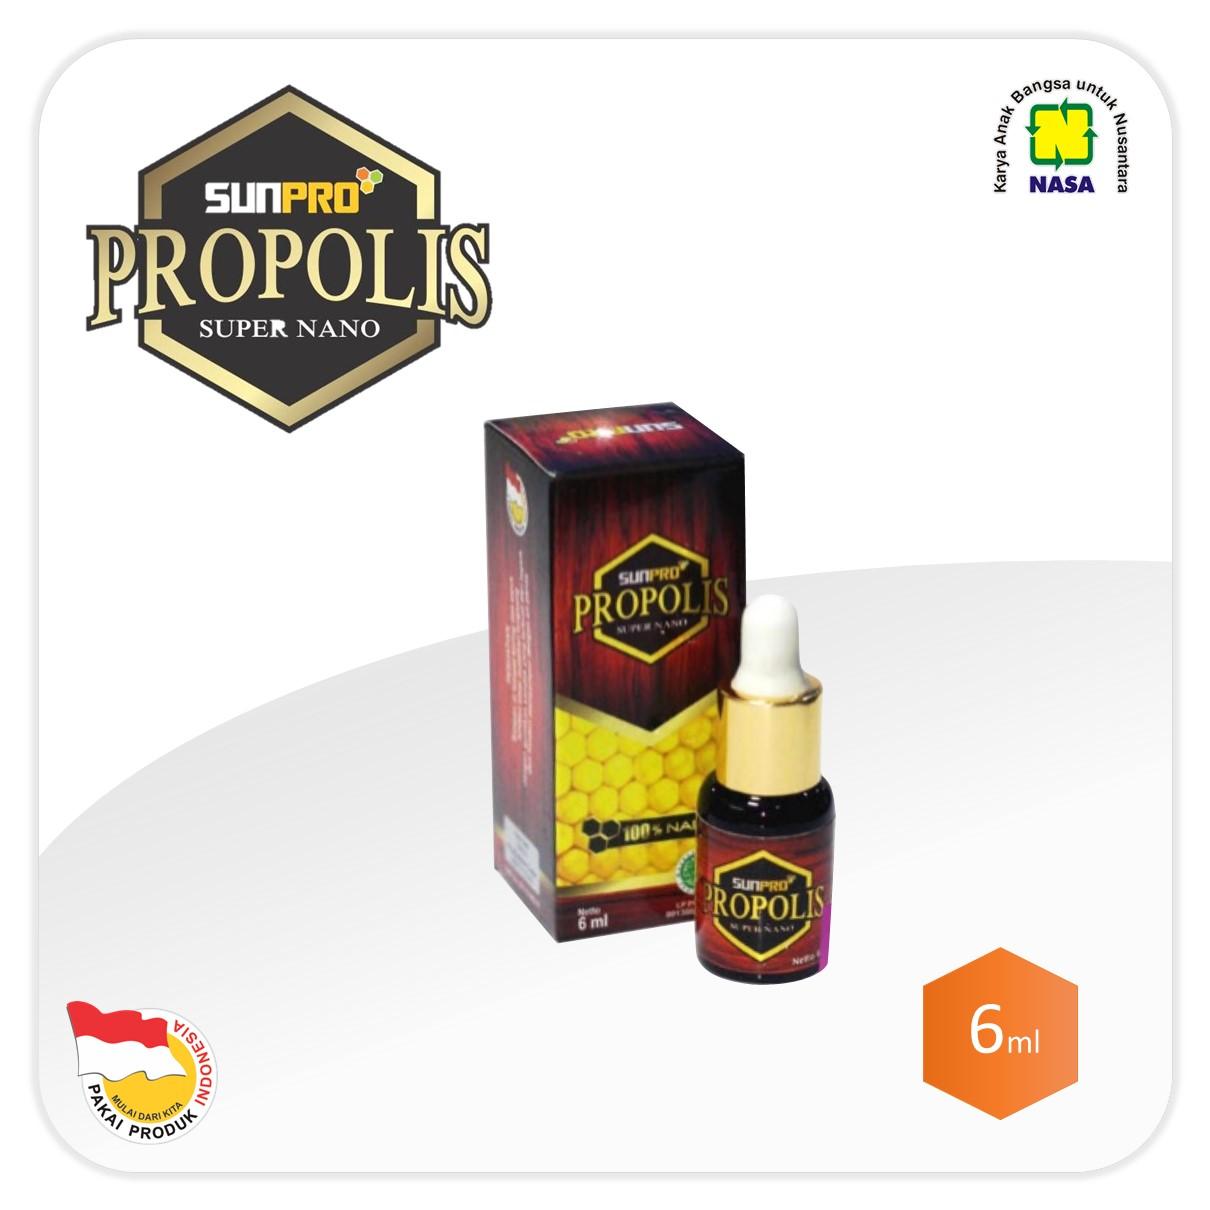 SUNPRO Super Nano Propolis